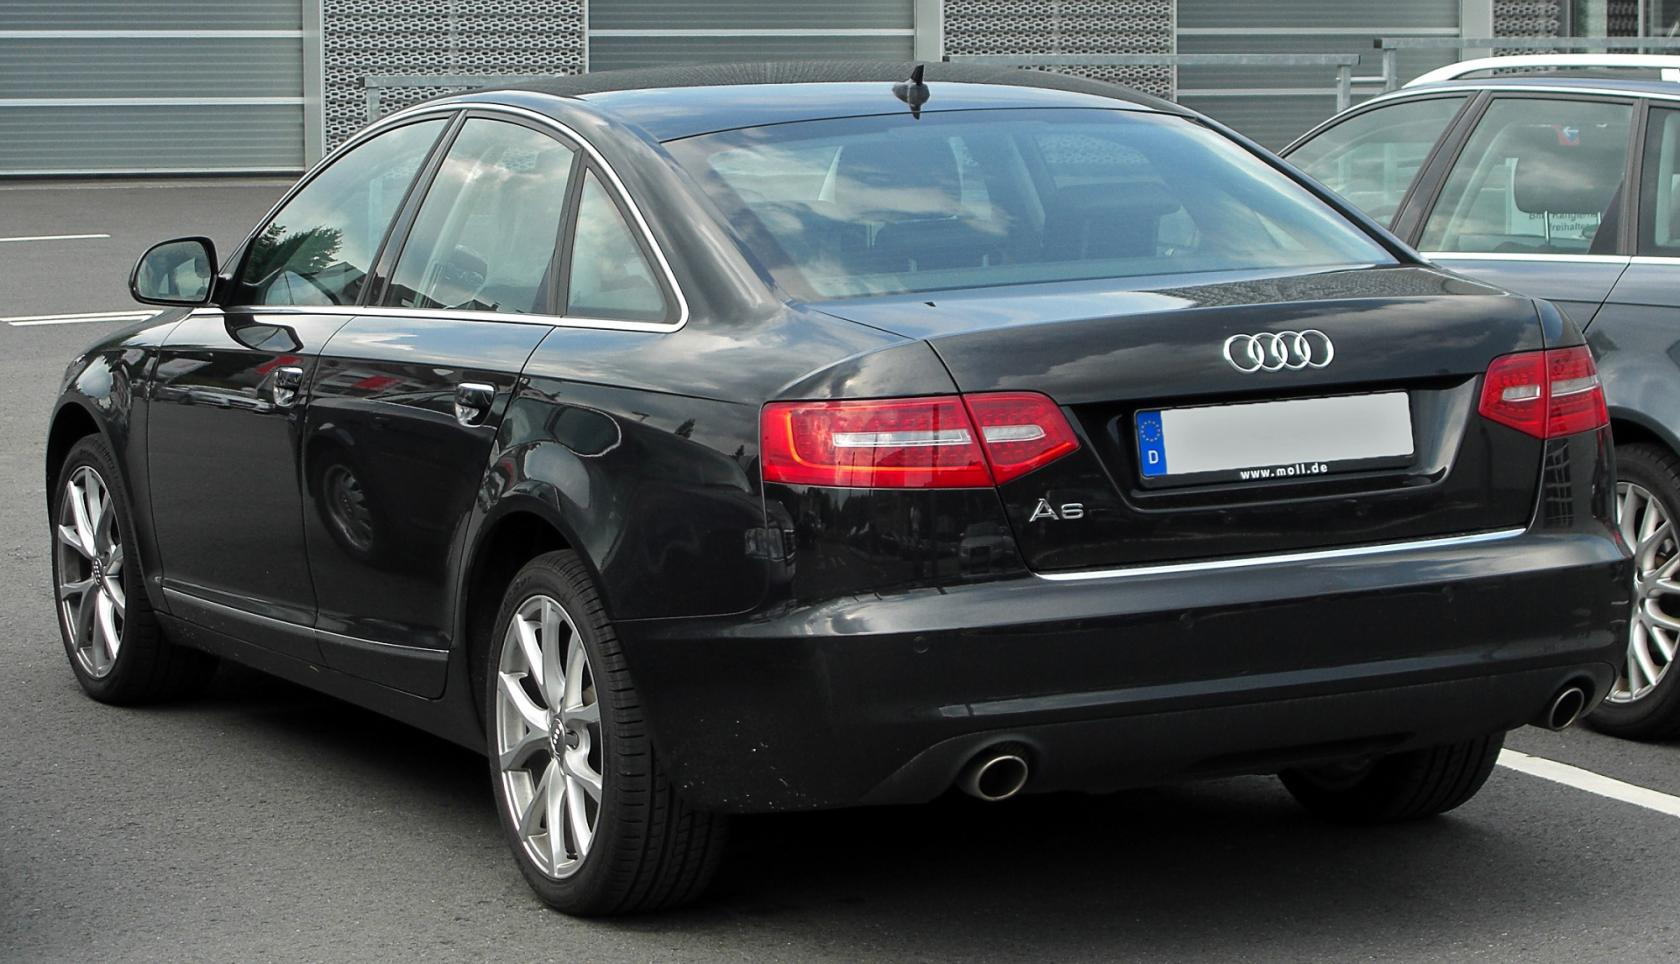 Audi-A6-C6-2